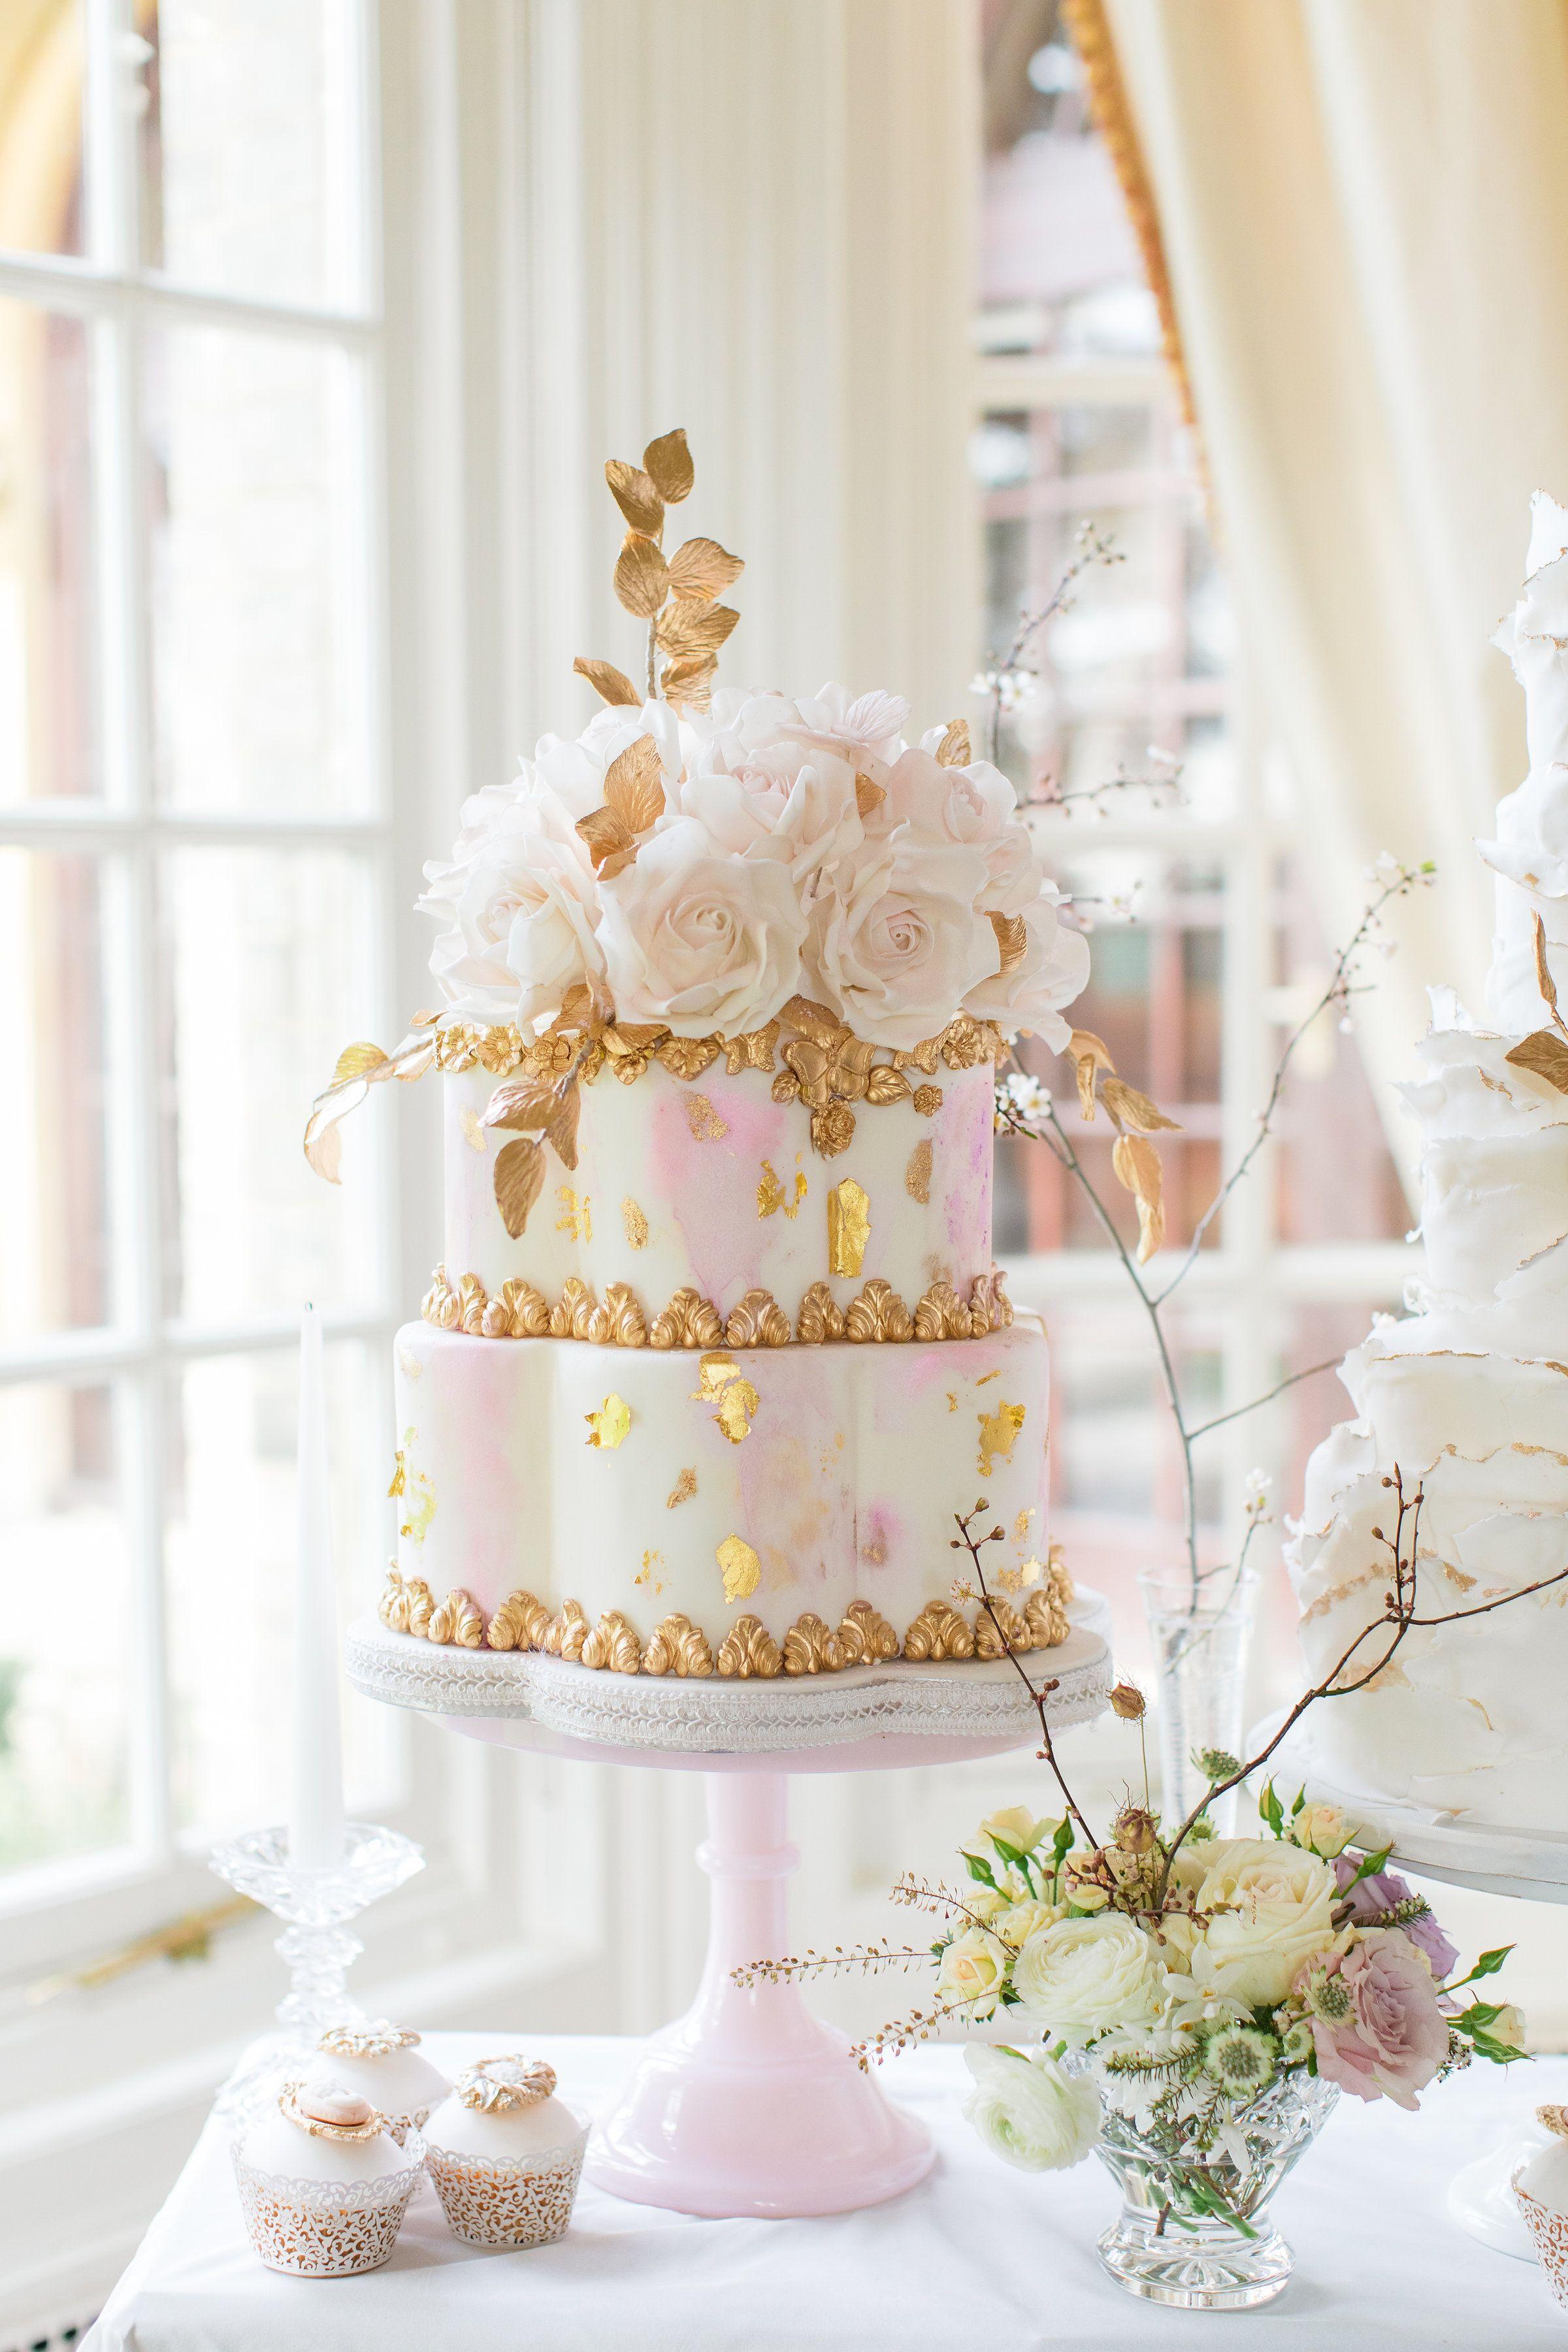 Elizabeths cake emporium watercolour luxury wedding cake